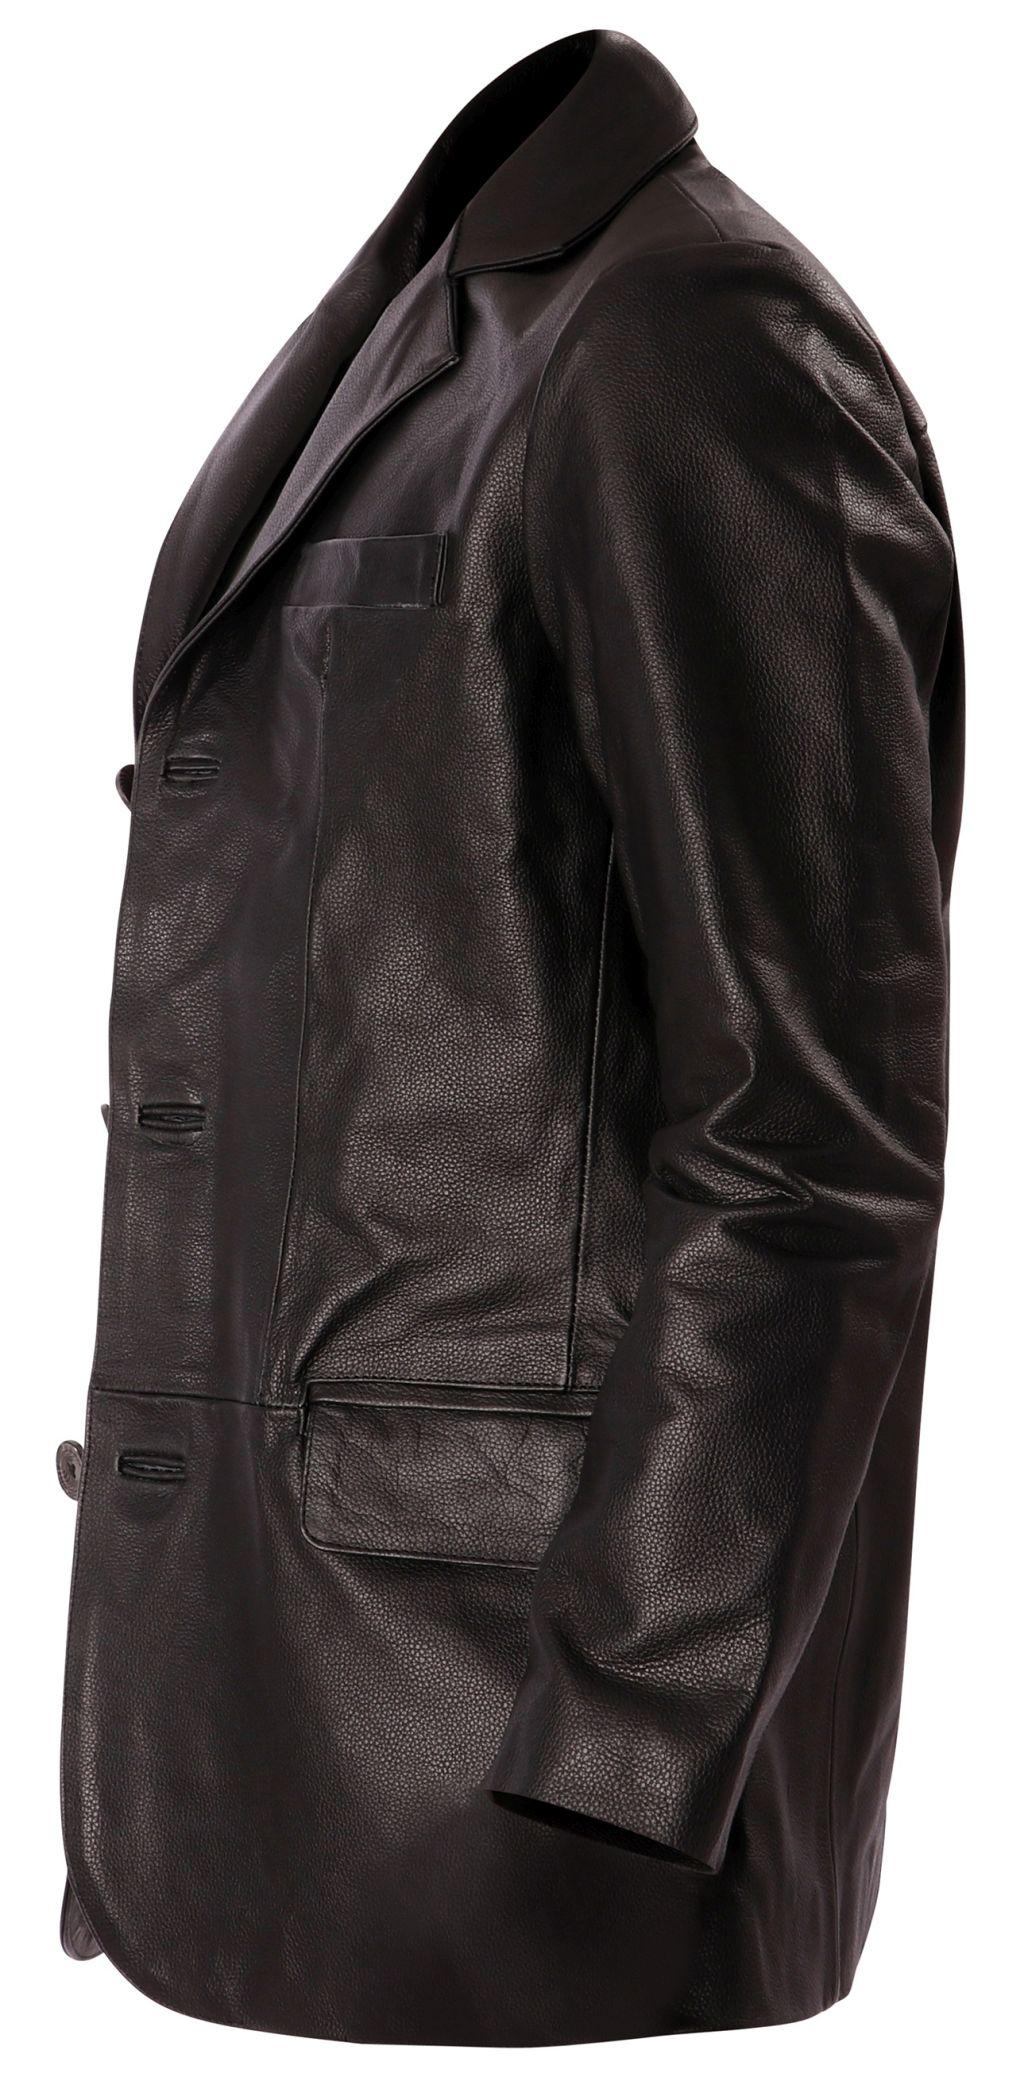 Bangla 1403 Jacke Blazer Lederjacke Herrenjacke Schwarz Gr M - 6 XL